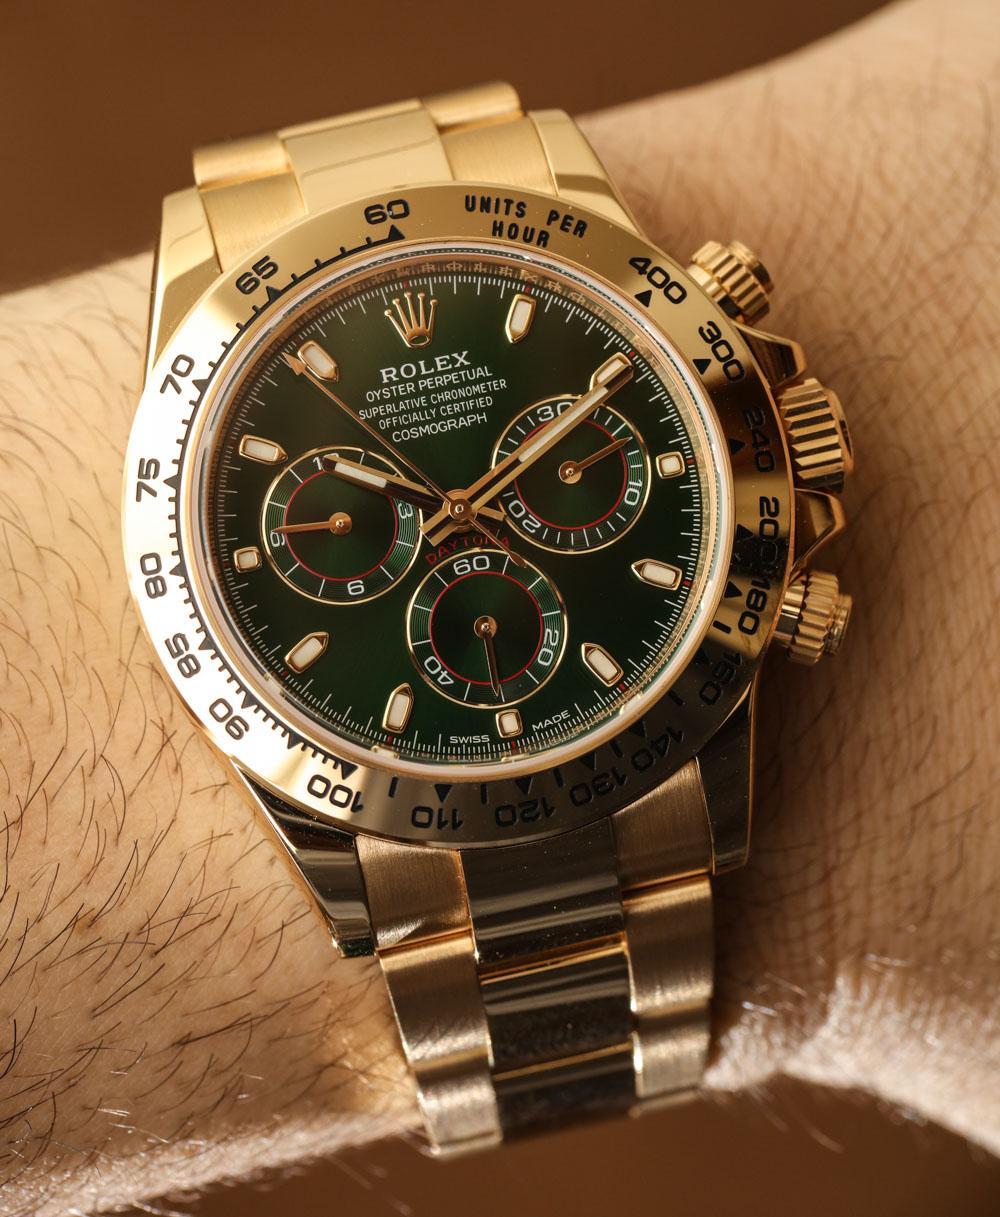 Rolex Daytona Cosmograph Replica Price Cheap Watches Mgc Gas Com